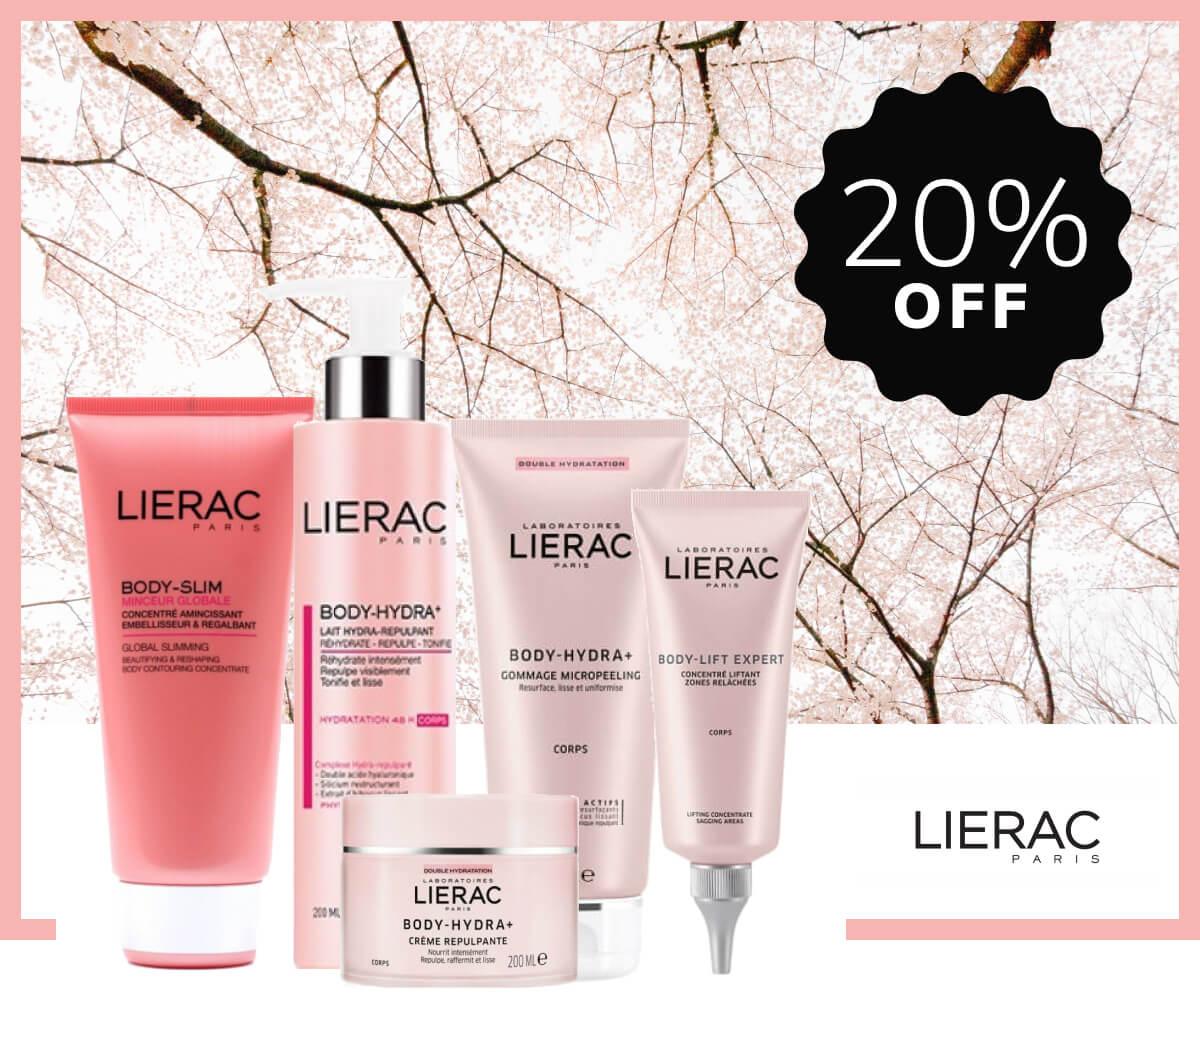 Lierac Body Care